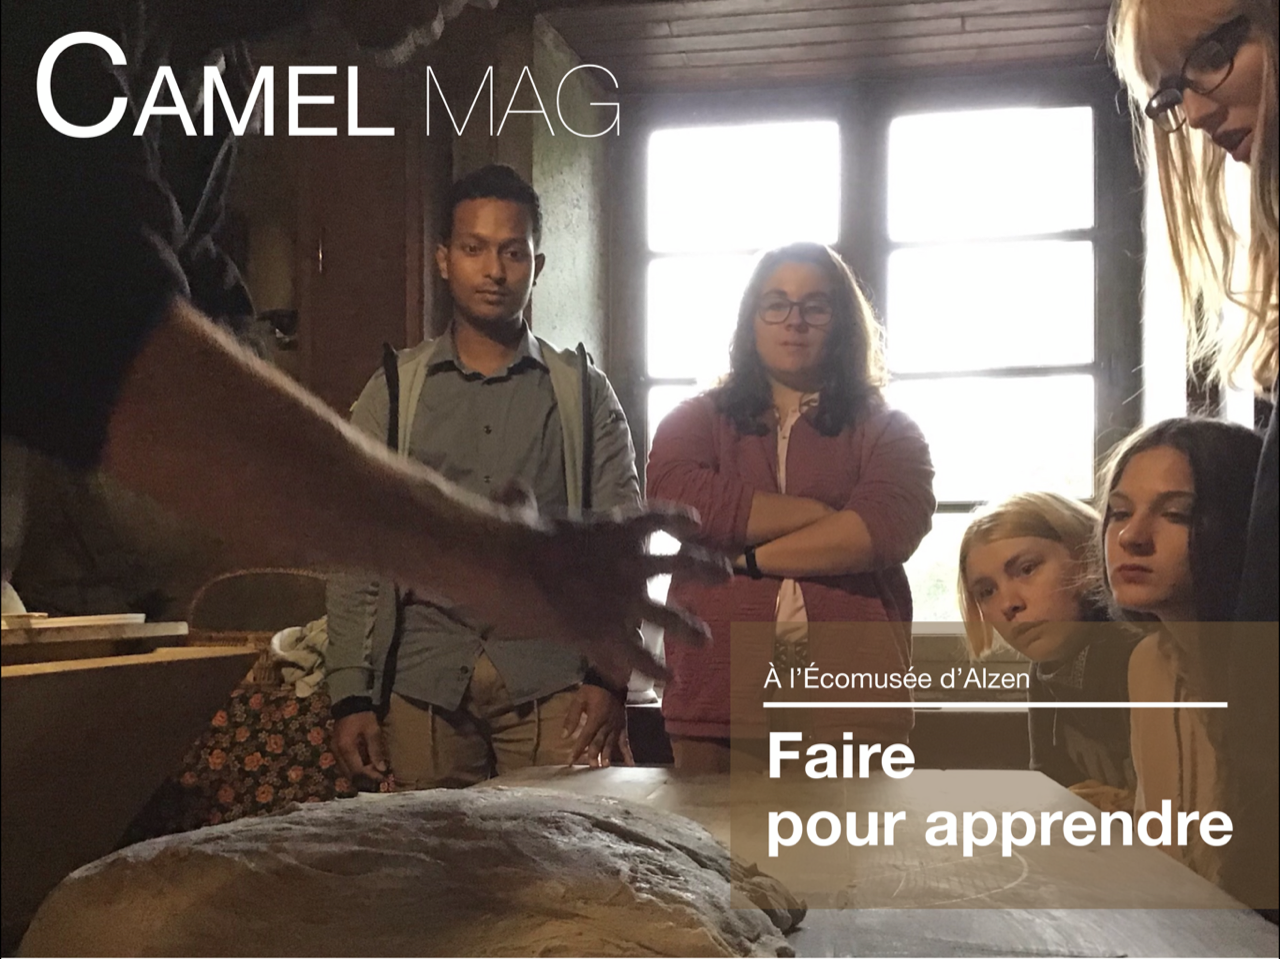 camel mag.png